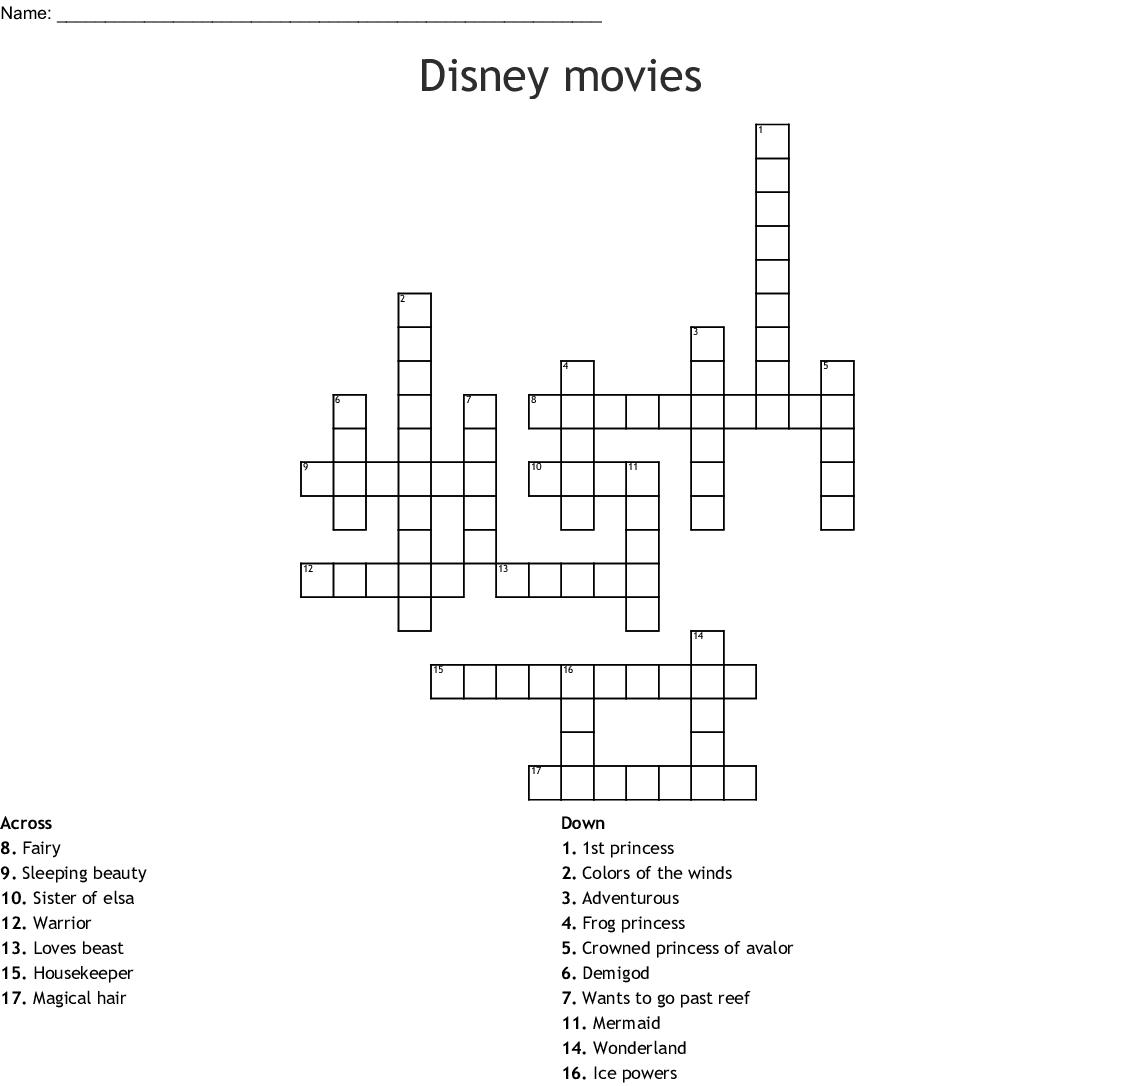 photograph regarding Disney Crossword Puzzles Printable identified as Princess Crossword - WordMint